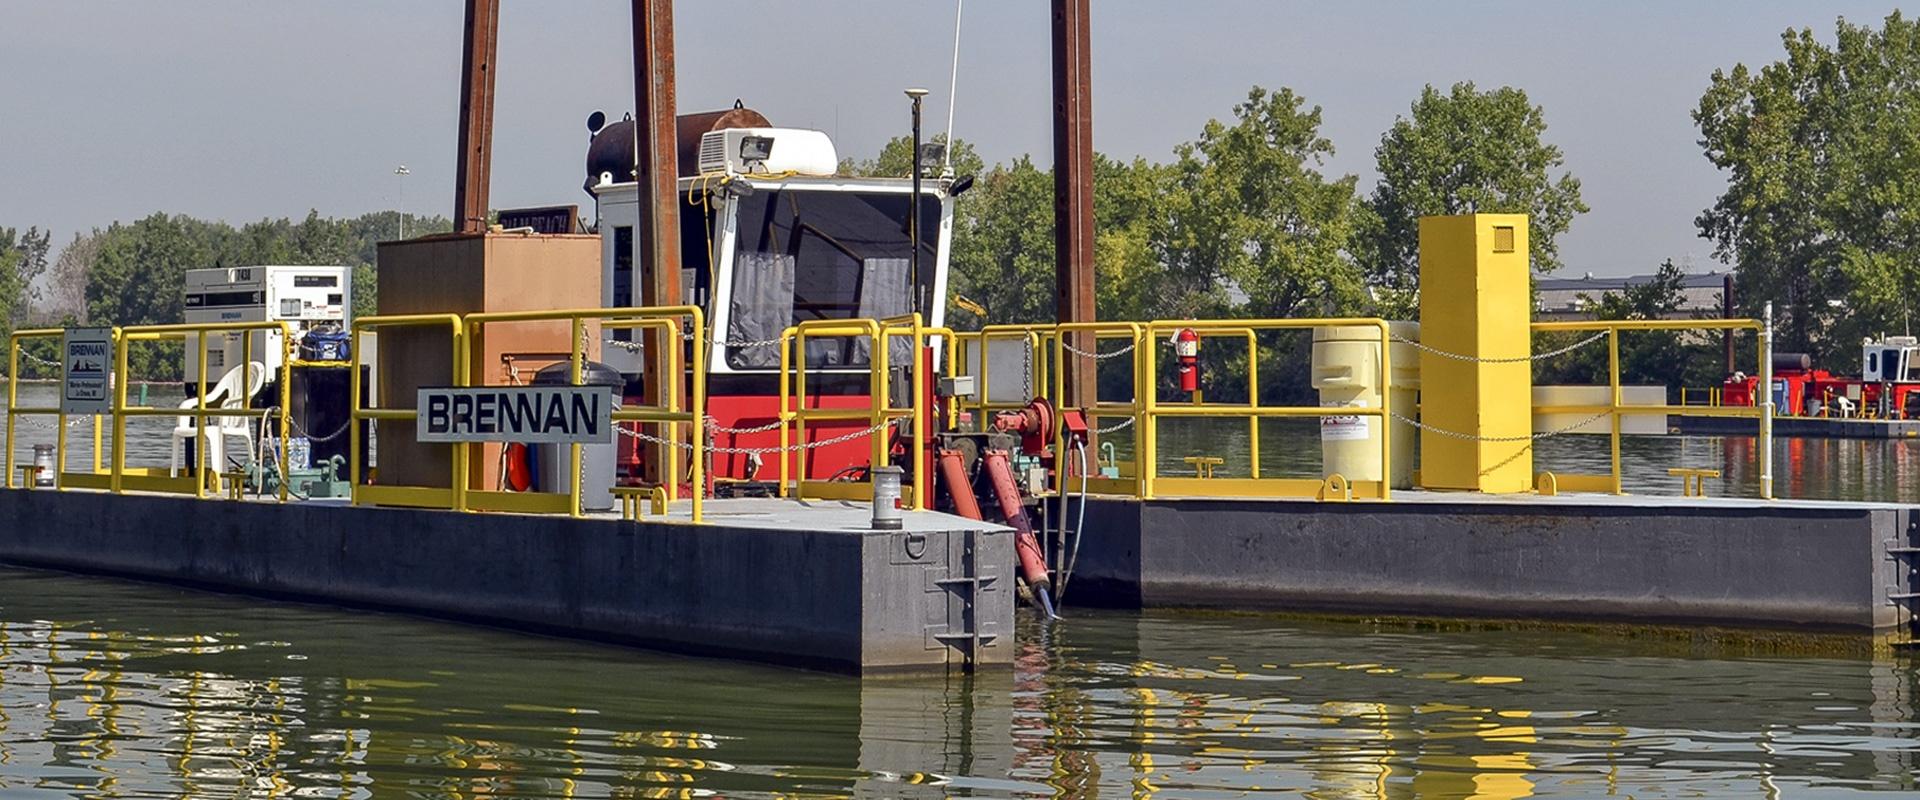 hydraulic dredging, environmental dredging, remedial dredging, brennan